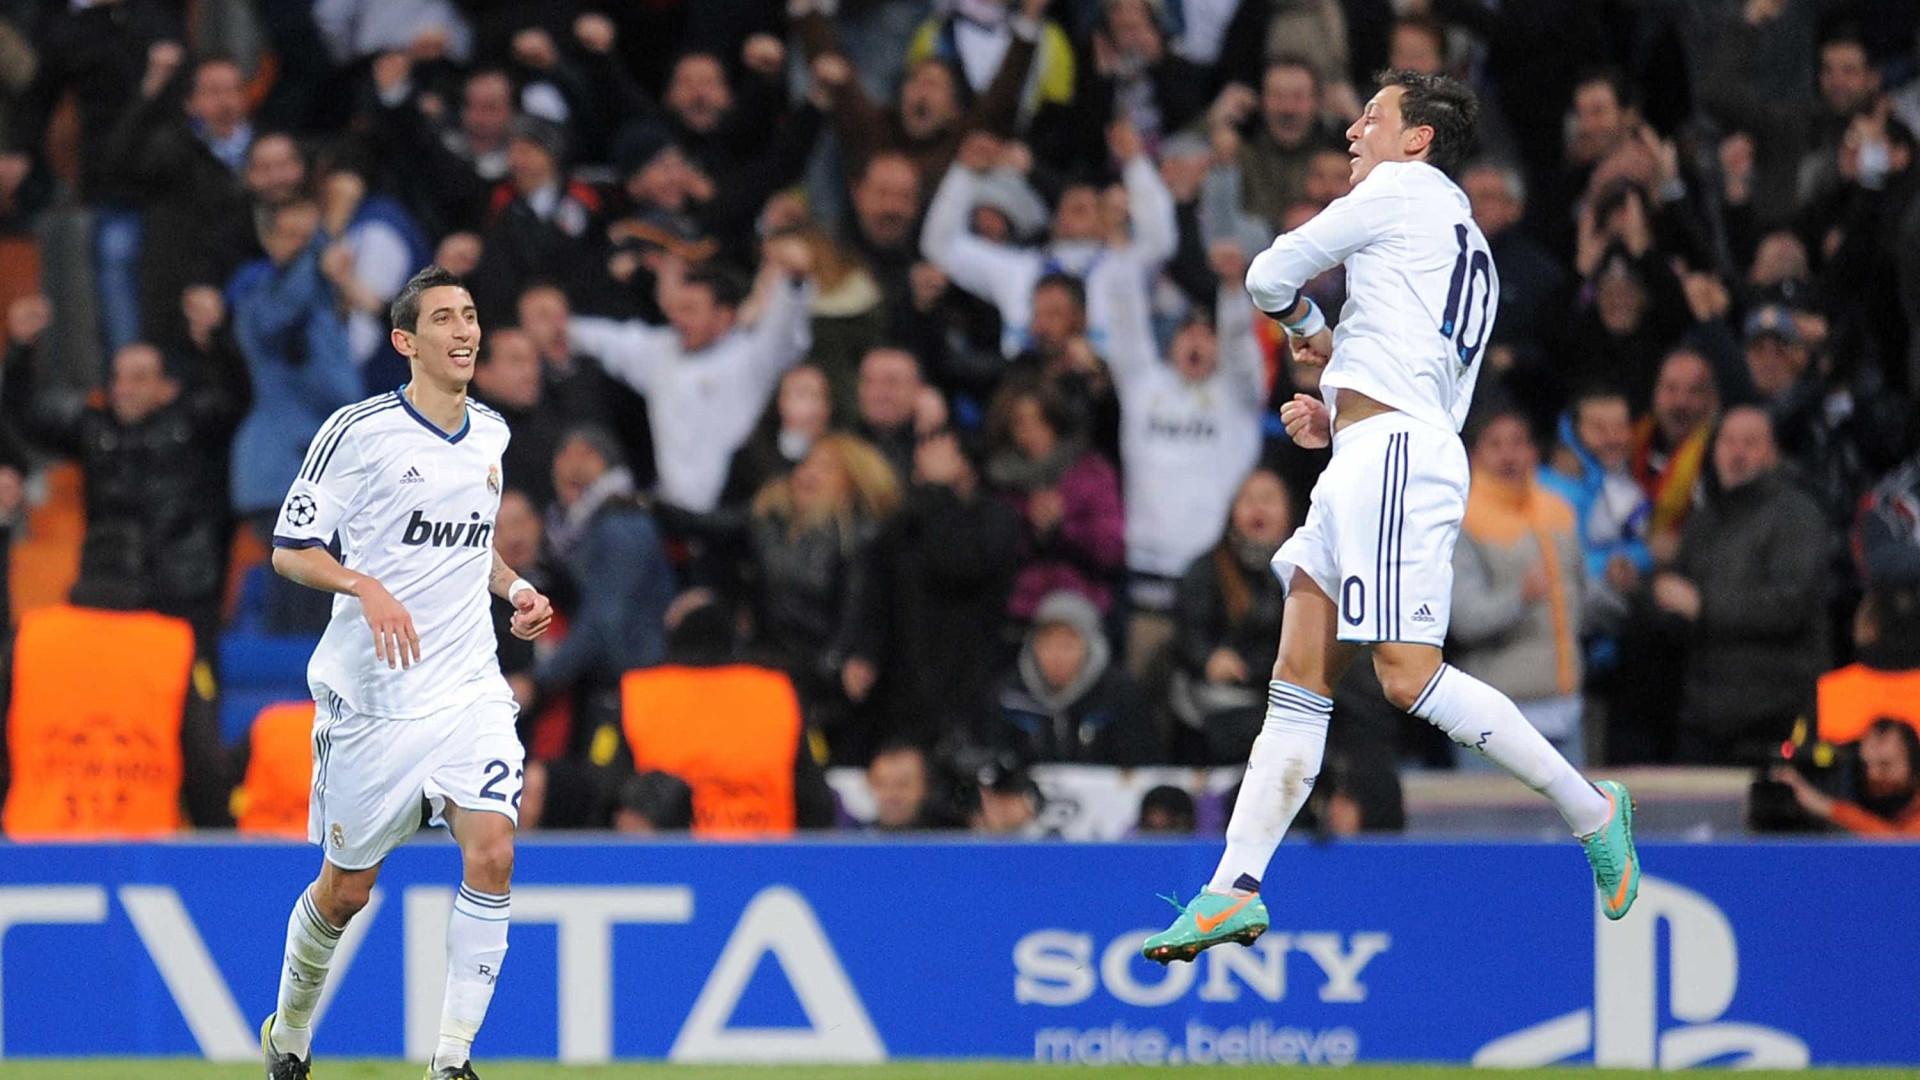 Di María e Mesut Ozil tencionam voltar ao Real Madrid